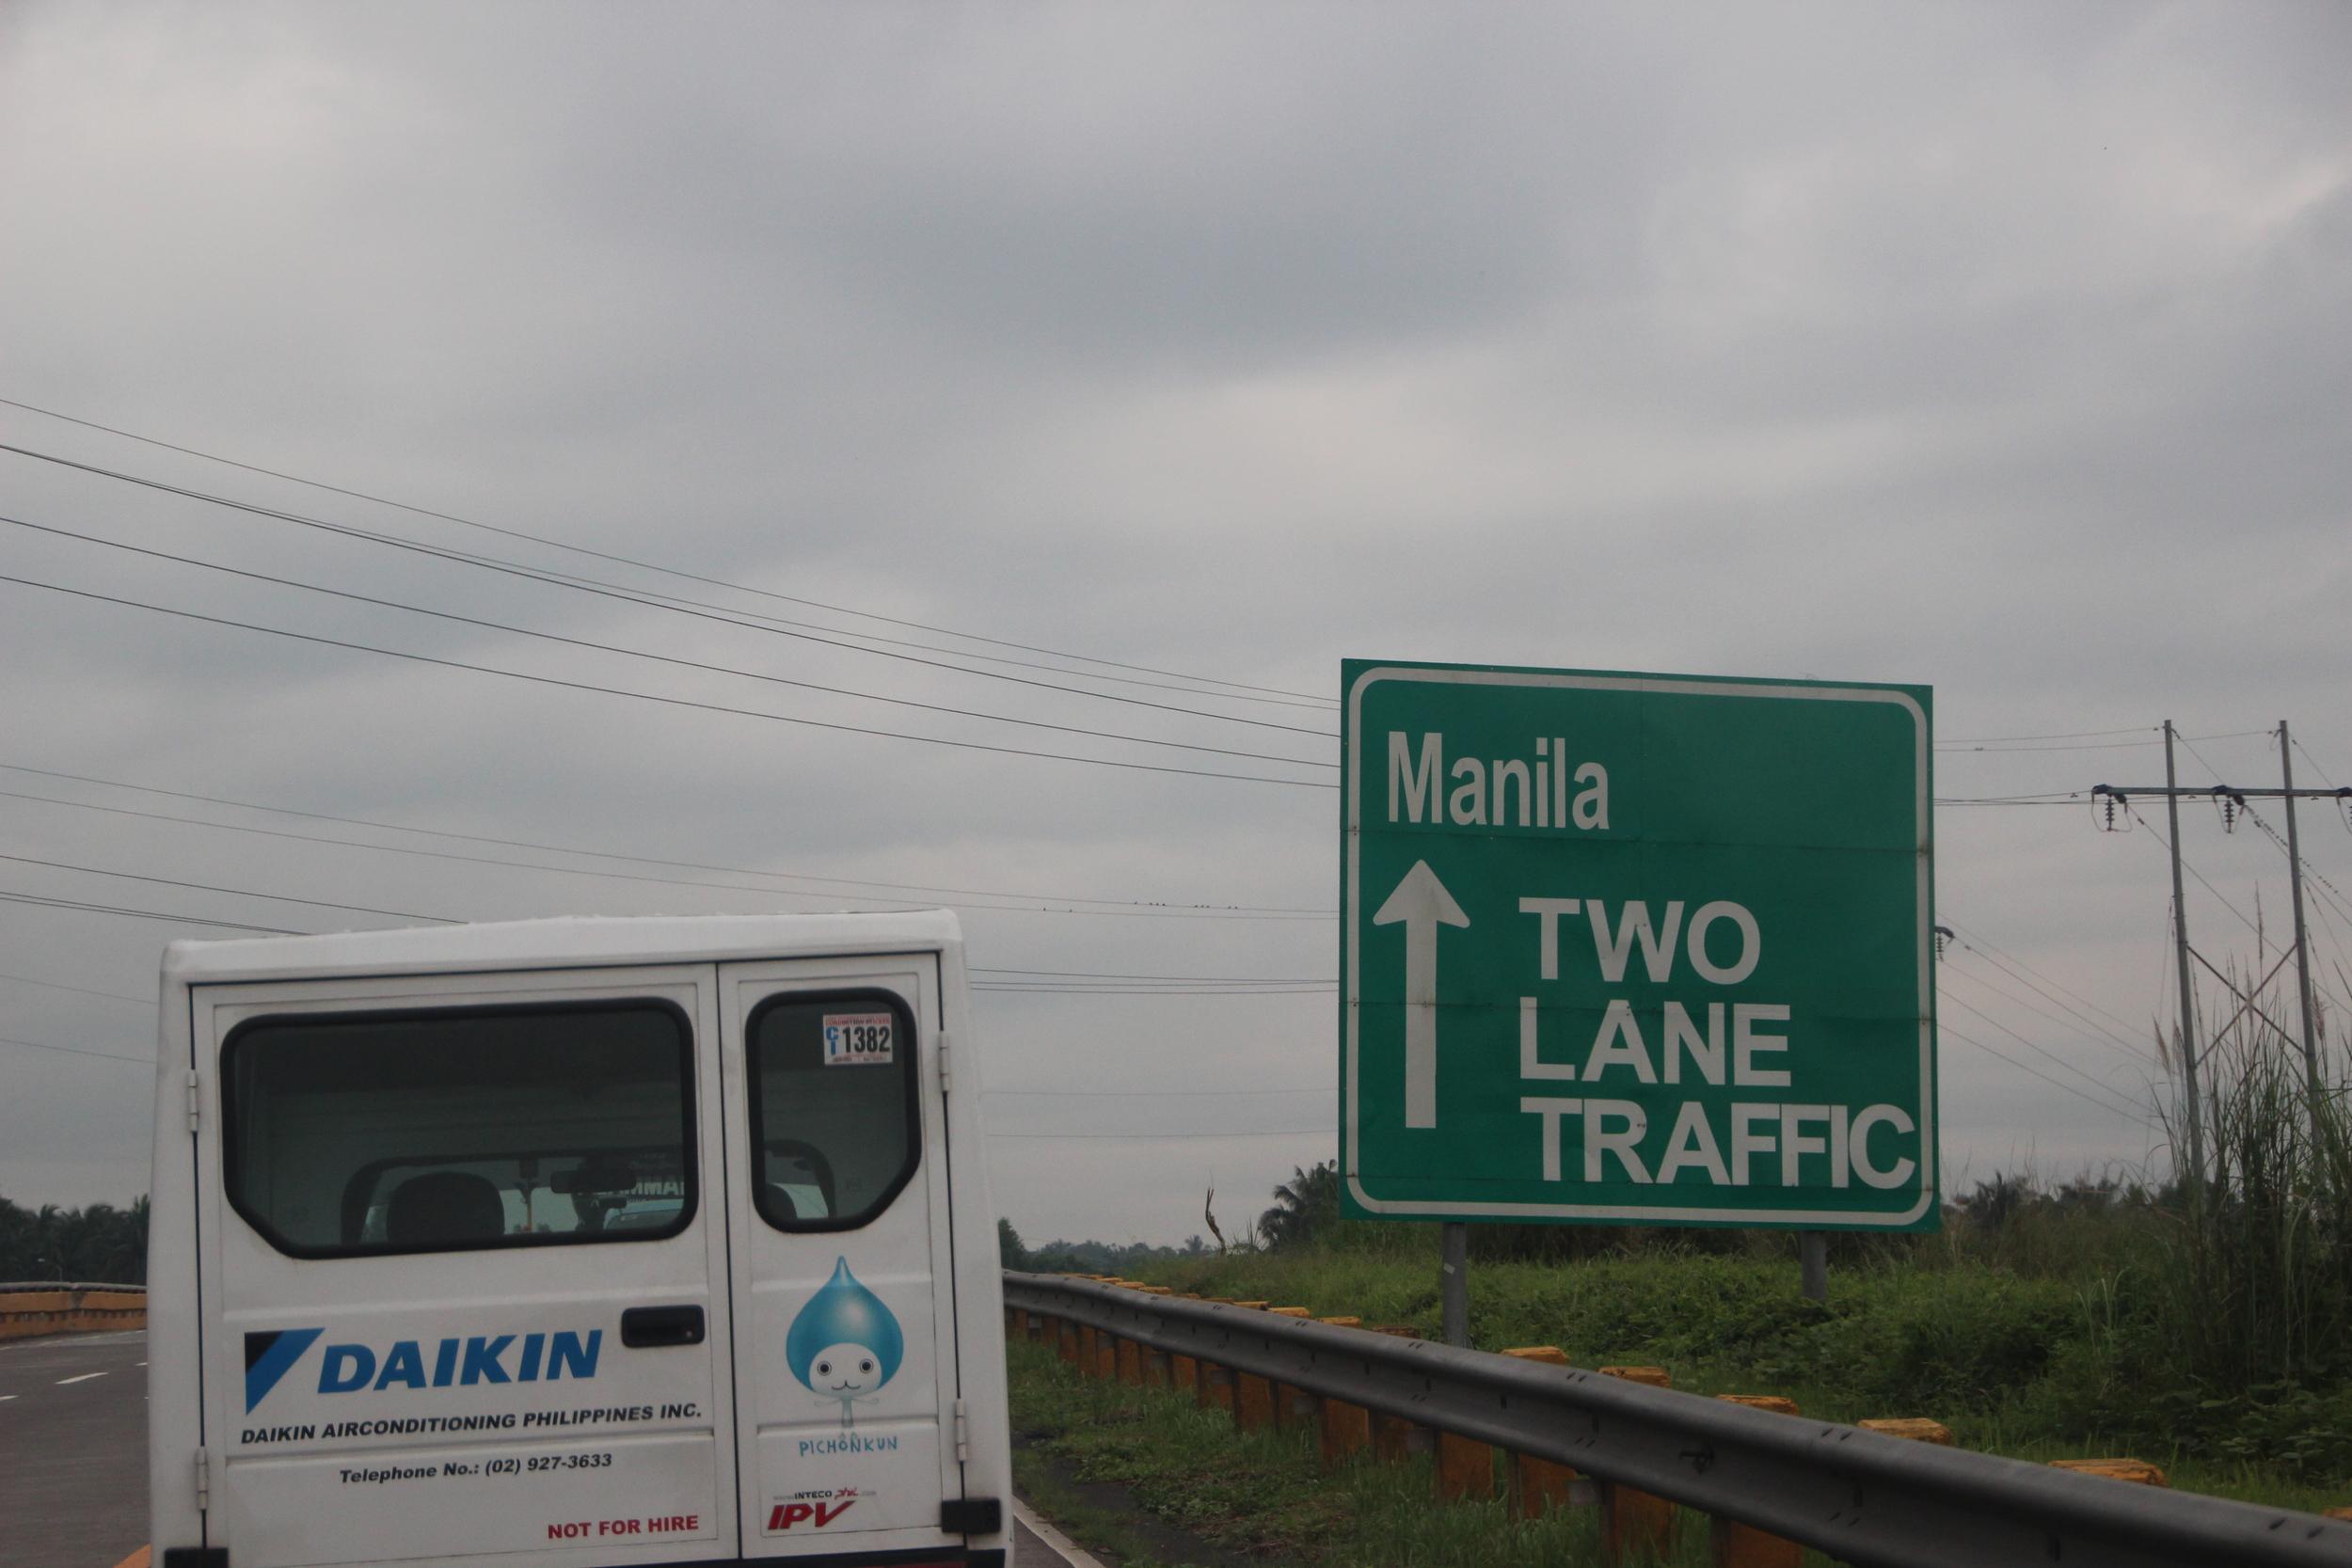 On the Way to Manila